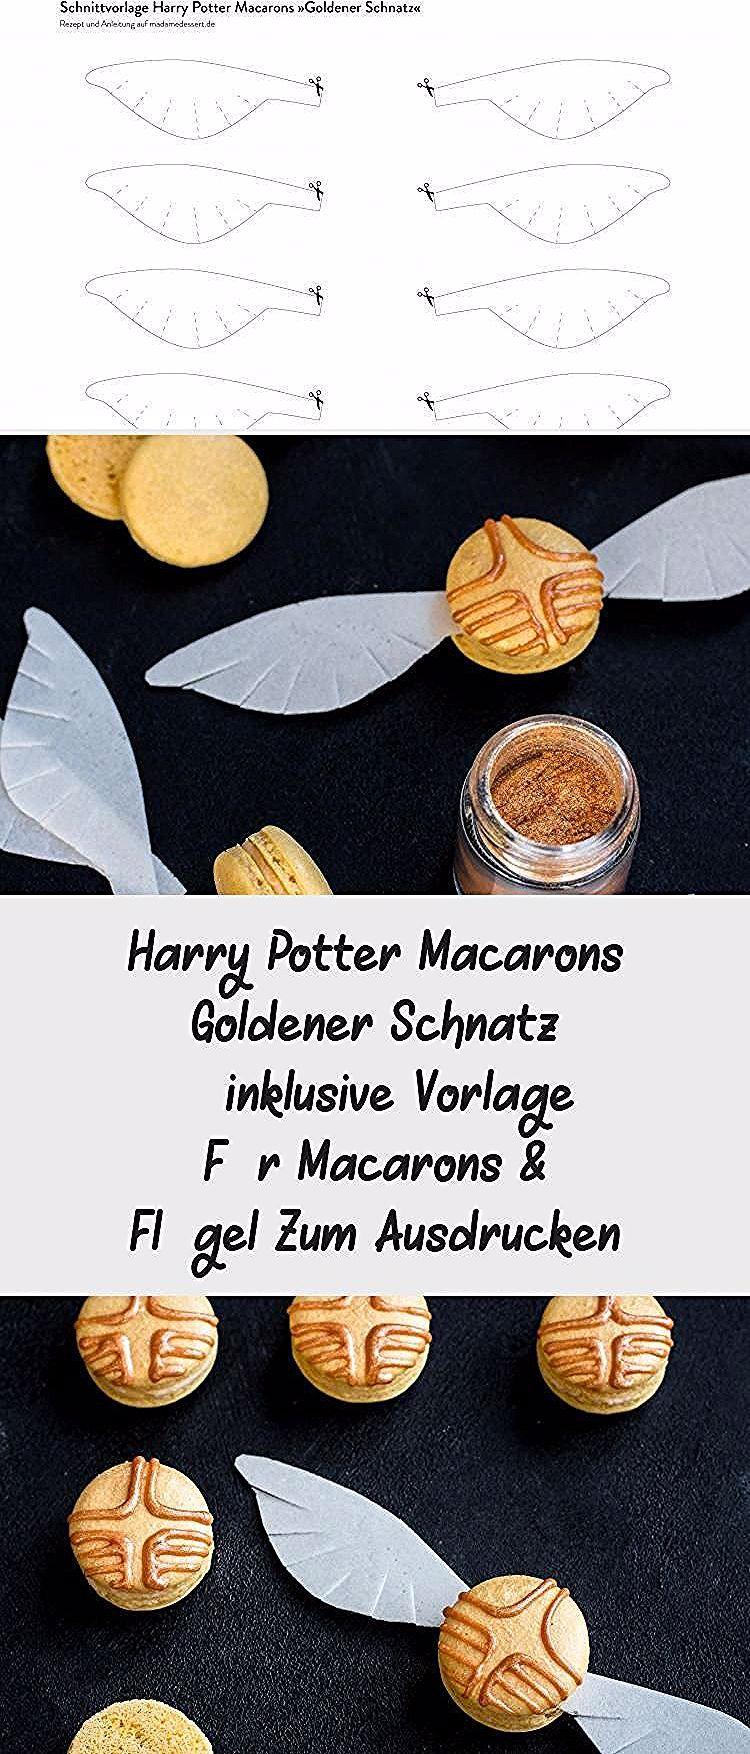 Anleitung Rezept Harry Potter Macarons Goldener Schnatz Inklusive Vorlage Fur Macarons Flugel Zum Ausdrucken Madame Cookie Recipes Food Perfect Cookie